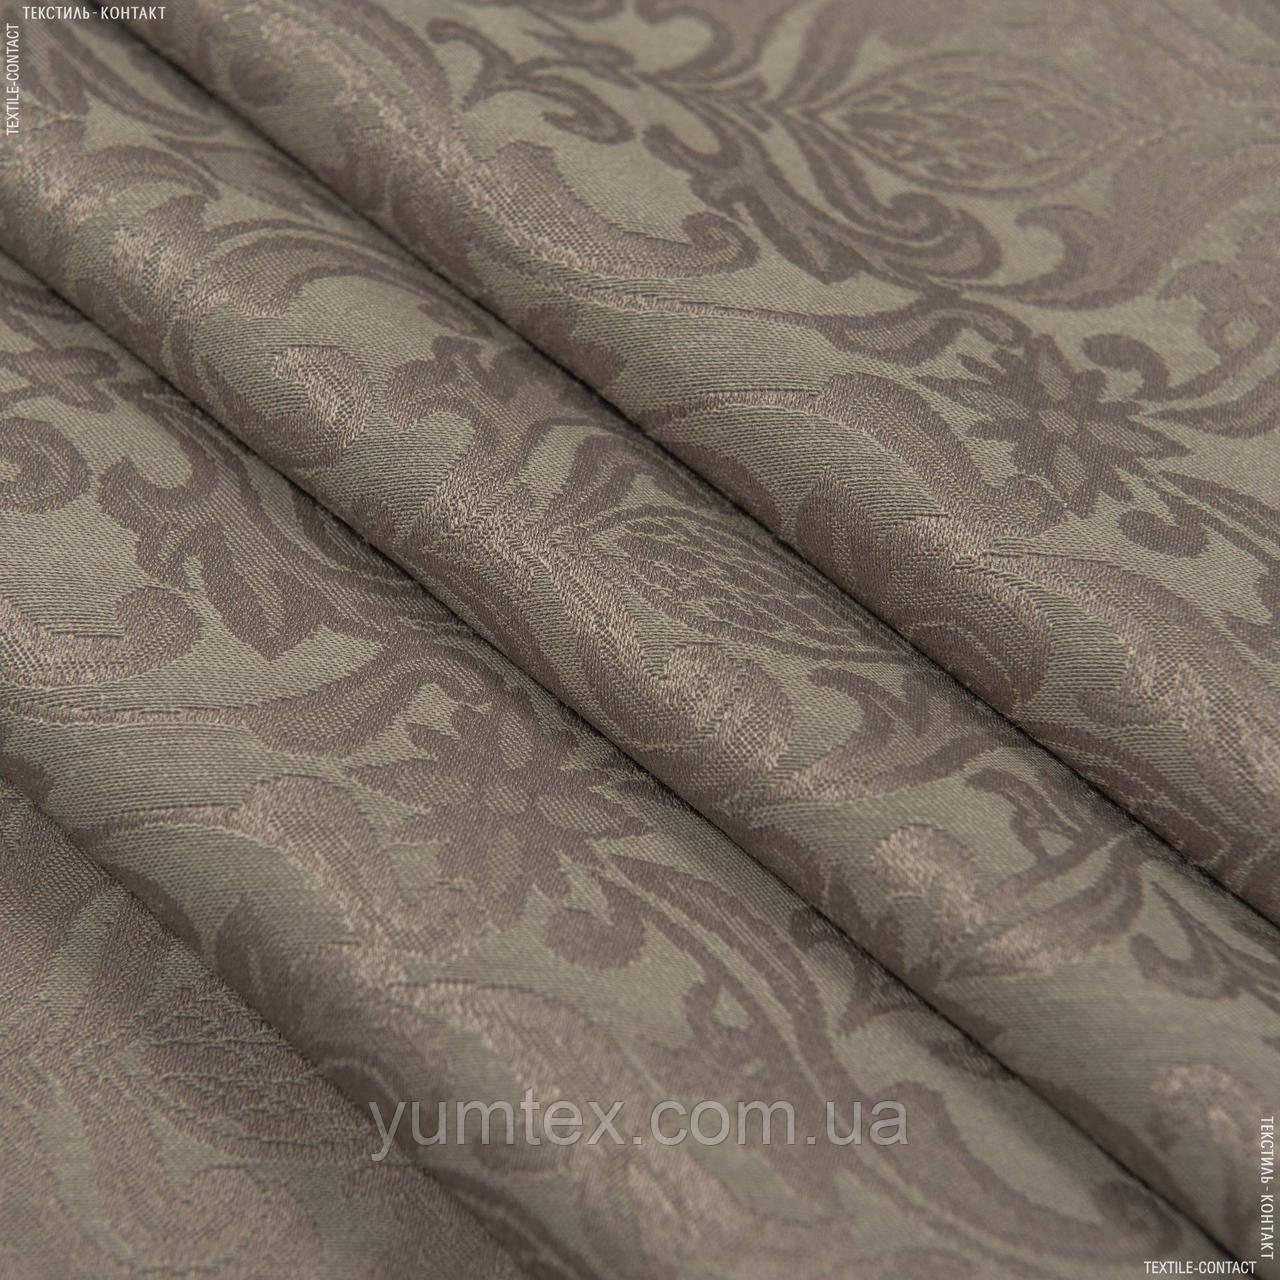 Ткань скатертная ingrid т.беж 122822